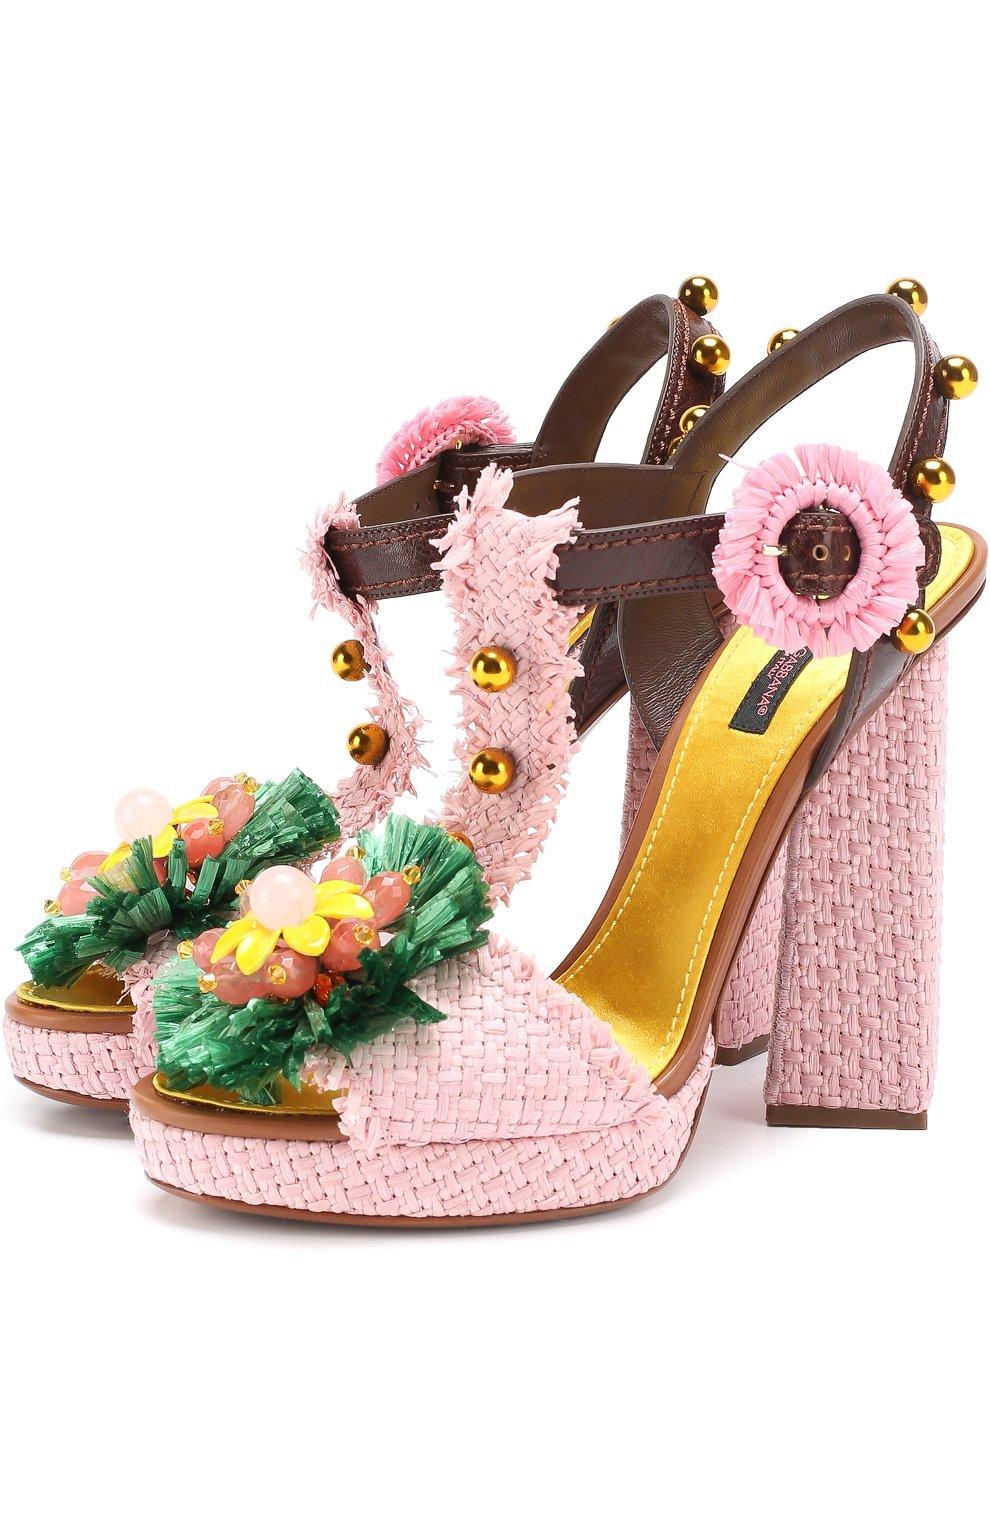 Плетеные босоножки Keira с декором   Фото №1